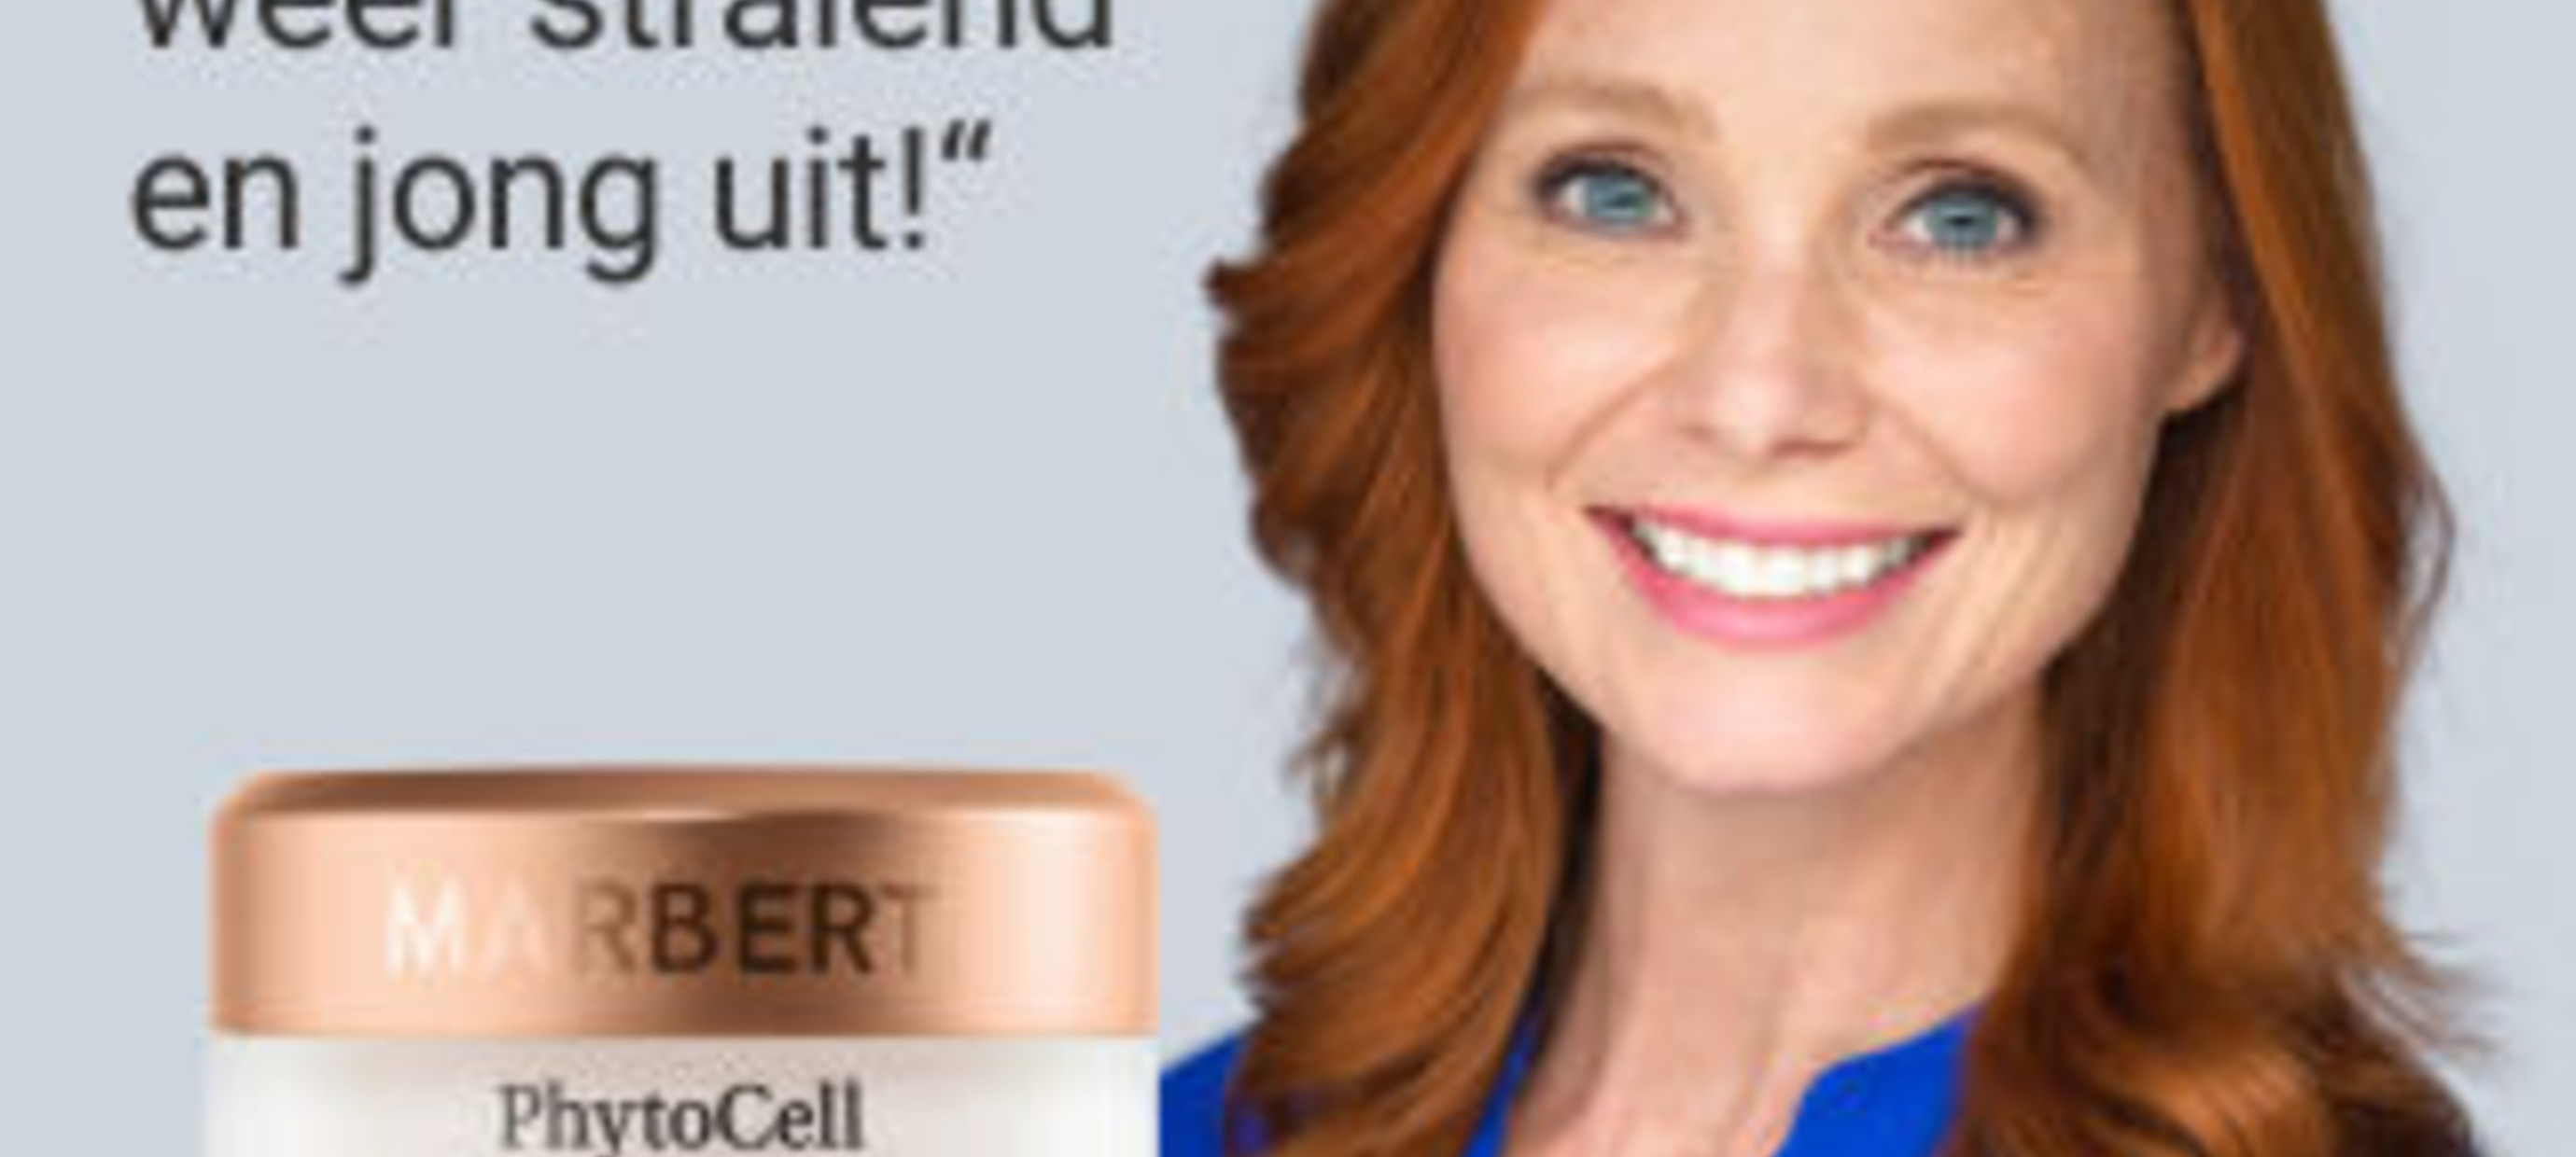 PhytoCell Deep Energy cream is mijn favoriete dagcrème